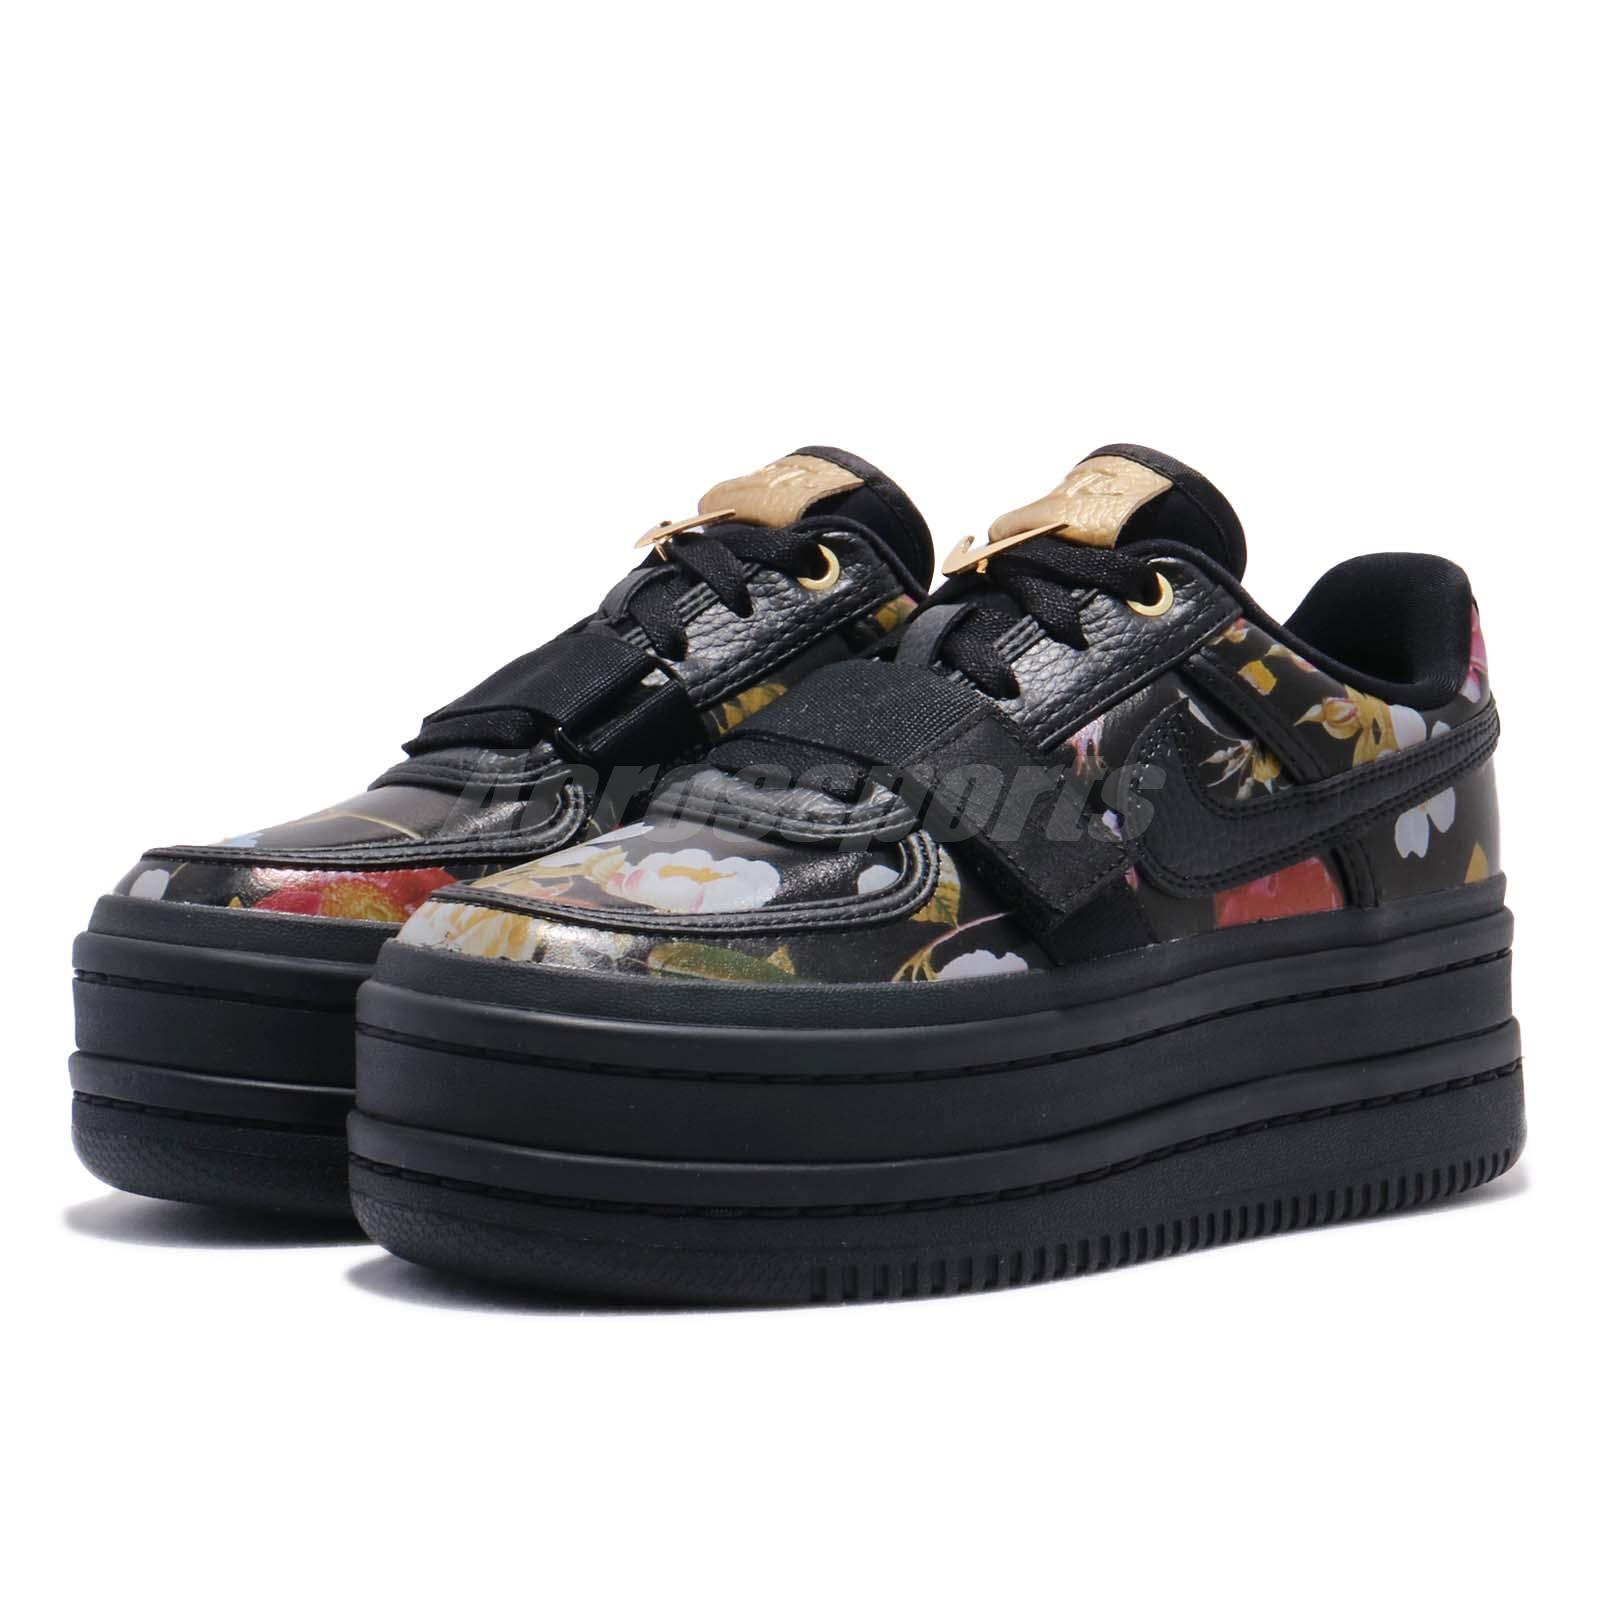 41aac16d276dbe Nike Wmns Vandal 2K LX Black Floral Platform Womens Casual Shoes ...